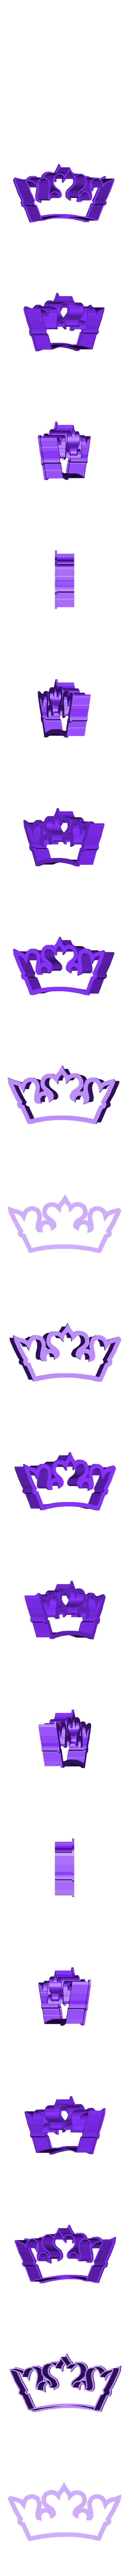 crown 1.stl Download STL file Crown cookie cutter set • 3D printer design, davidruizo